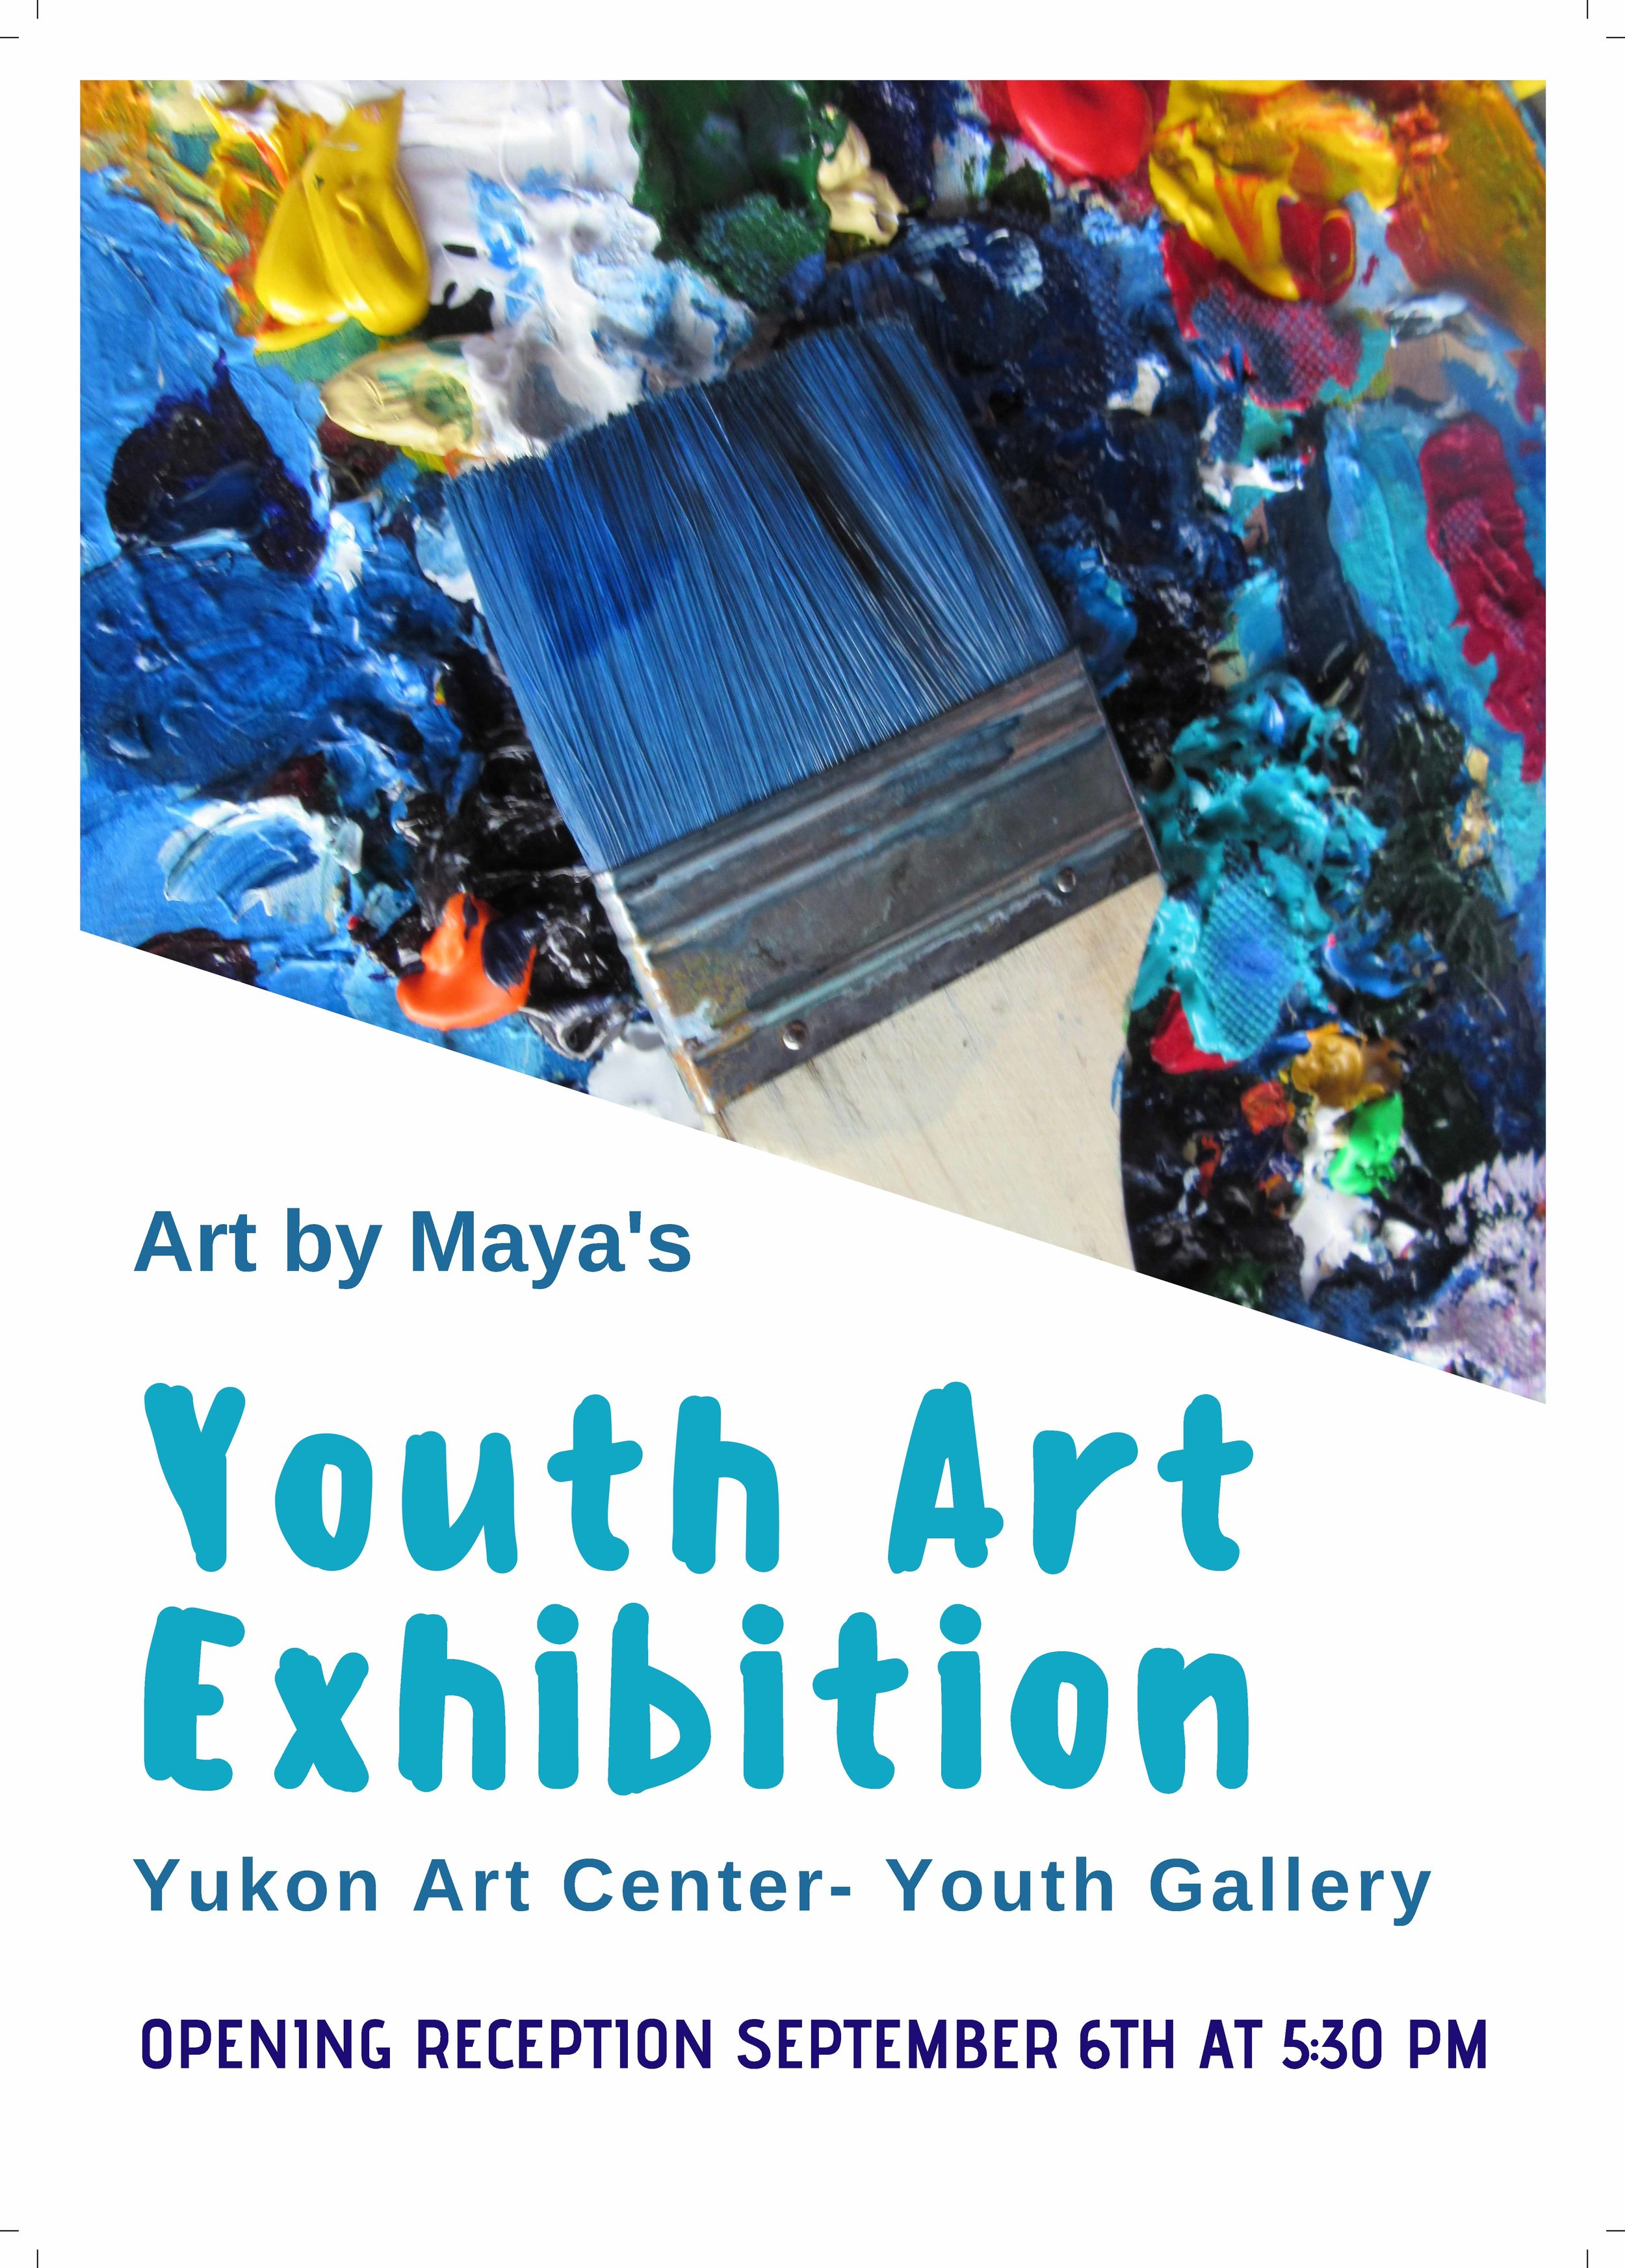 Yukon Art Center Poster_Web 2.jpg